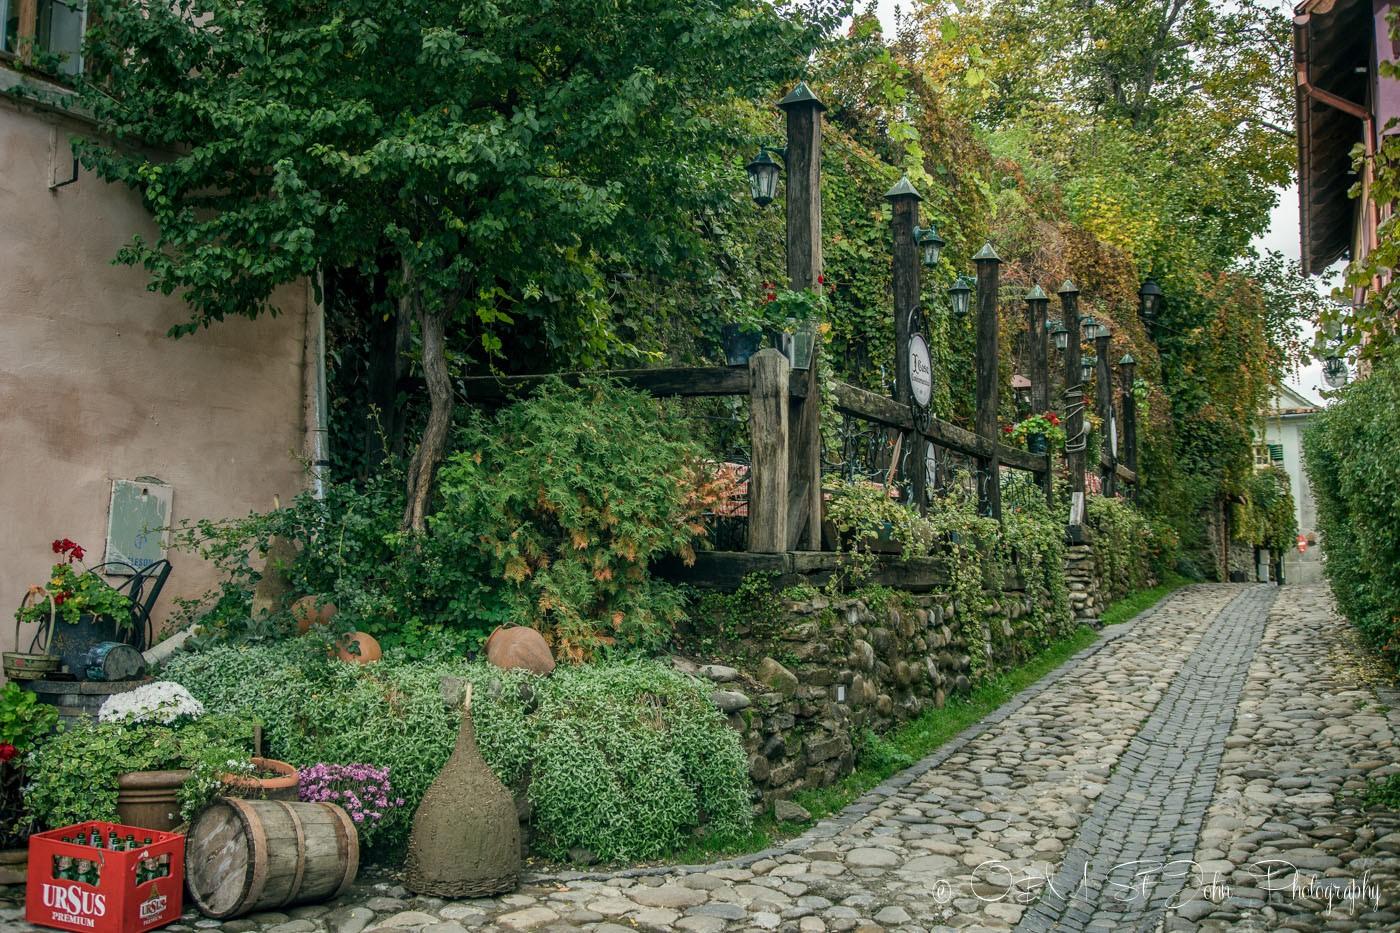 Charming street in Sighisoara. Romania